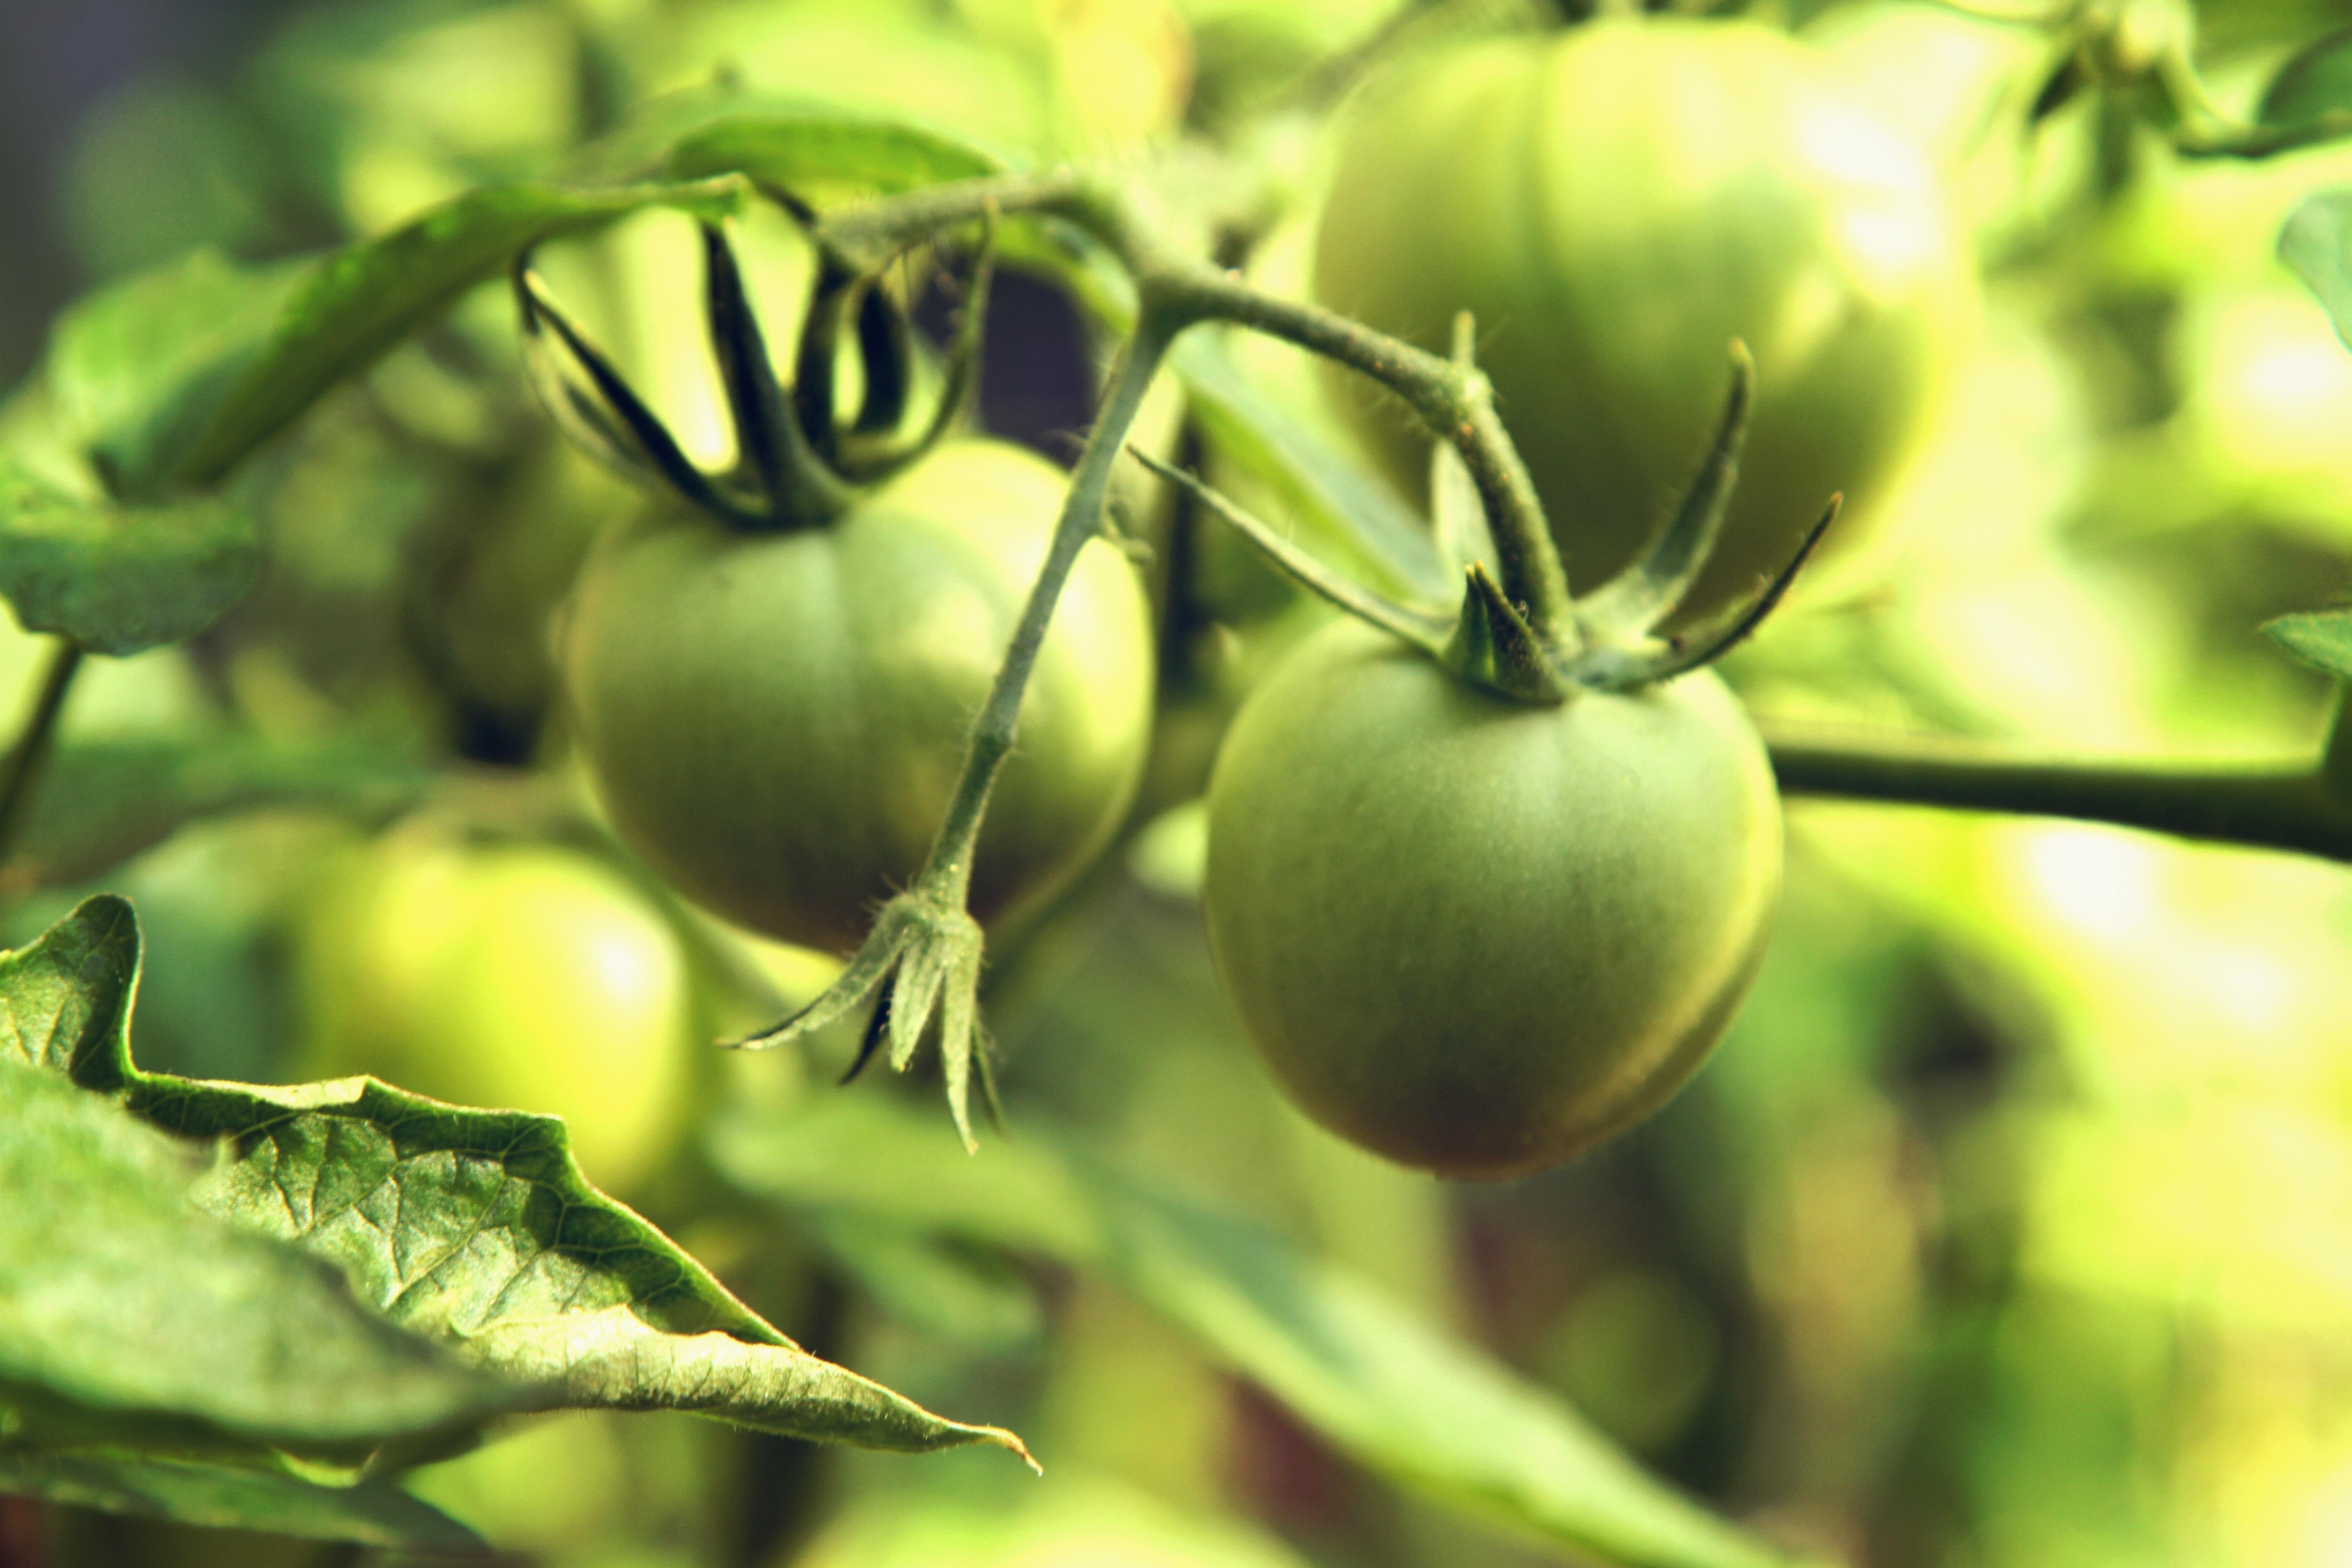 round green fruit